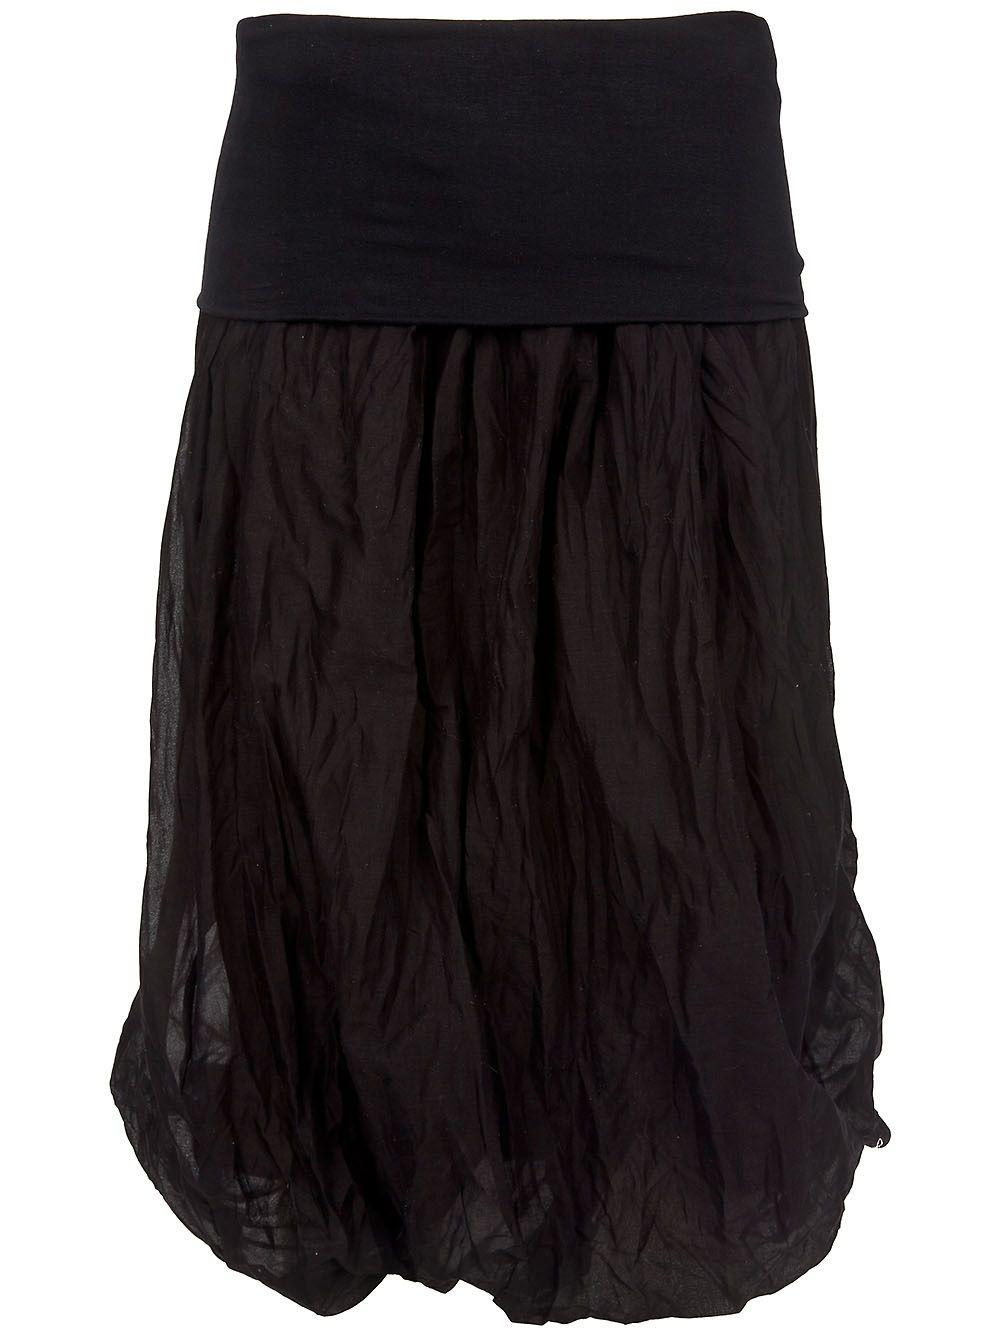 Niu - 'Double' dress skirt